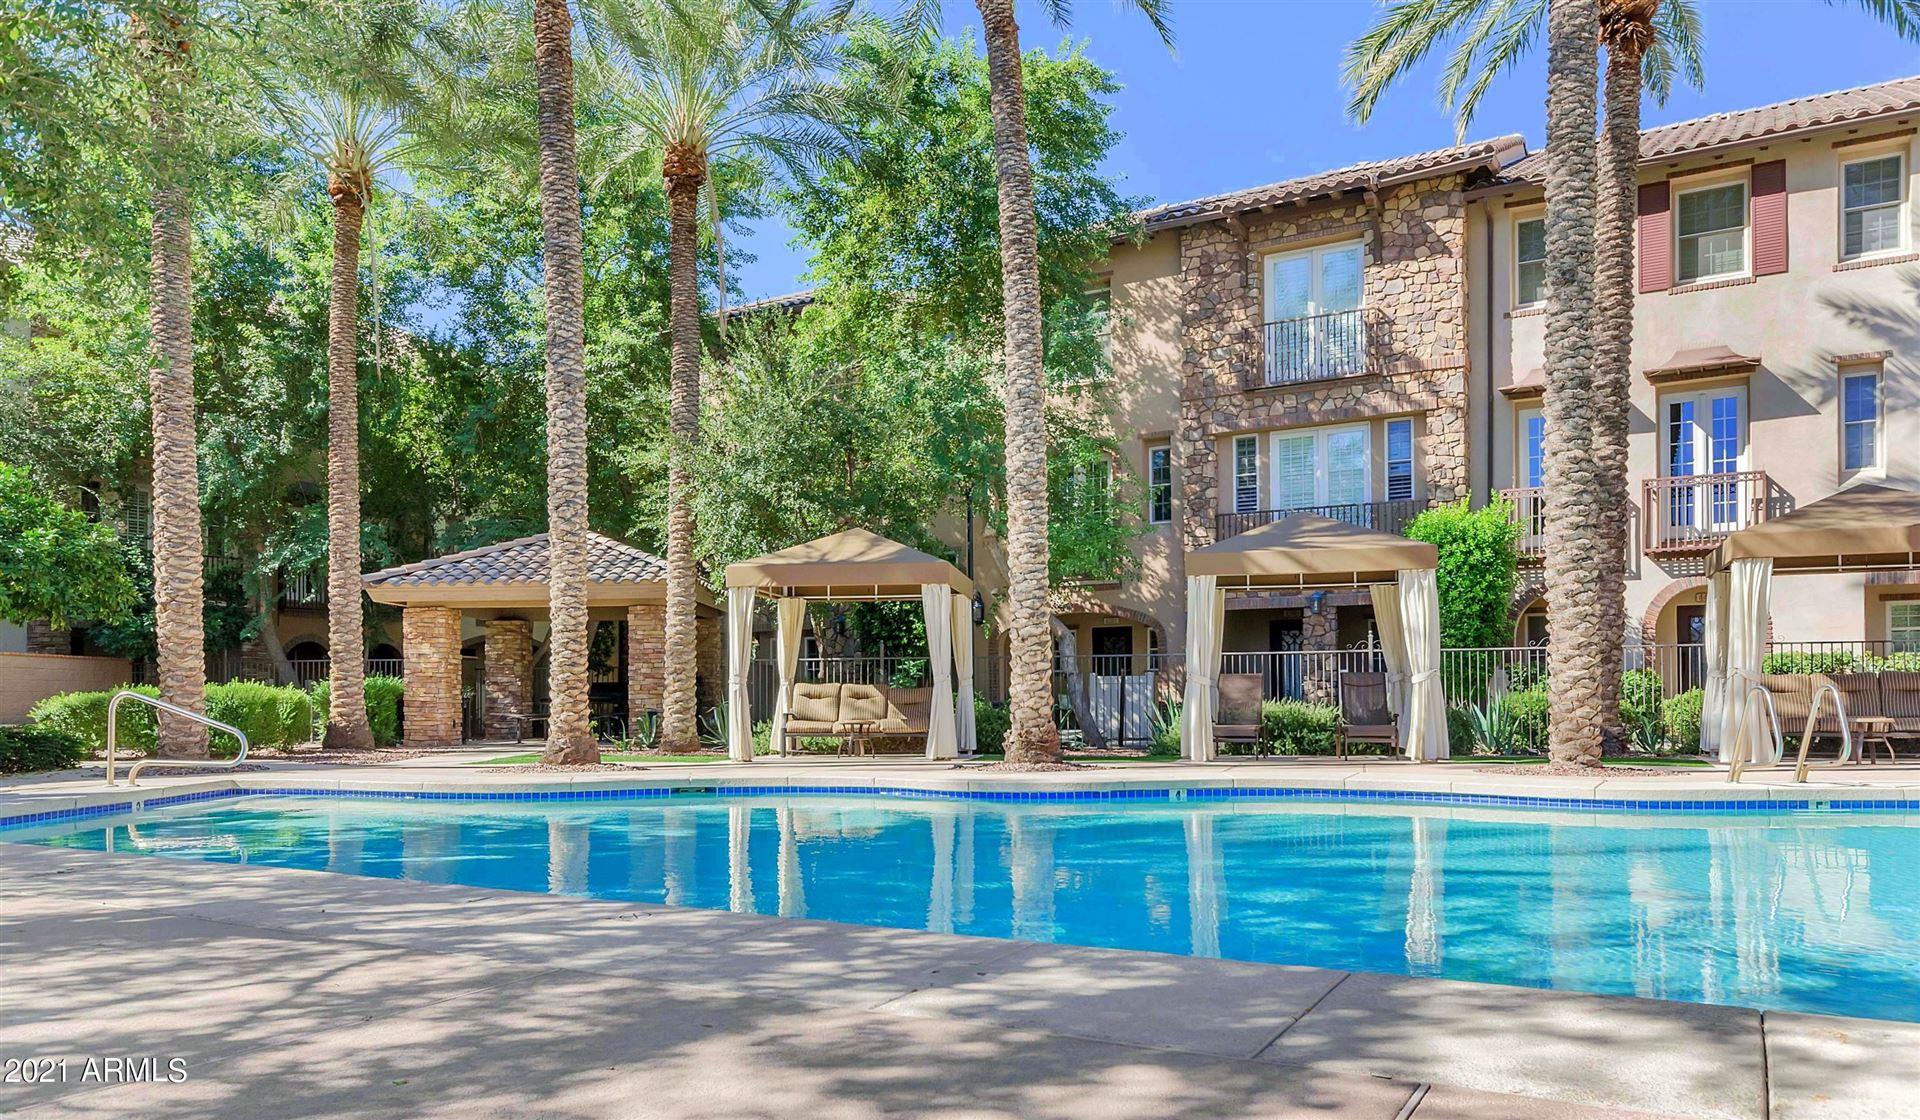 4411 N 24TH Way, Phoenix, AZ 85016 - MLS#: 6229084